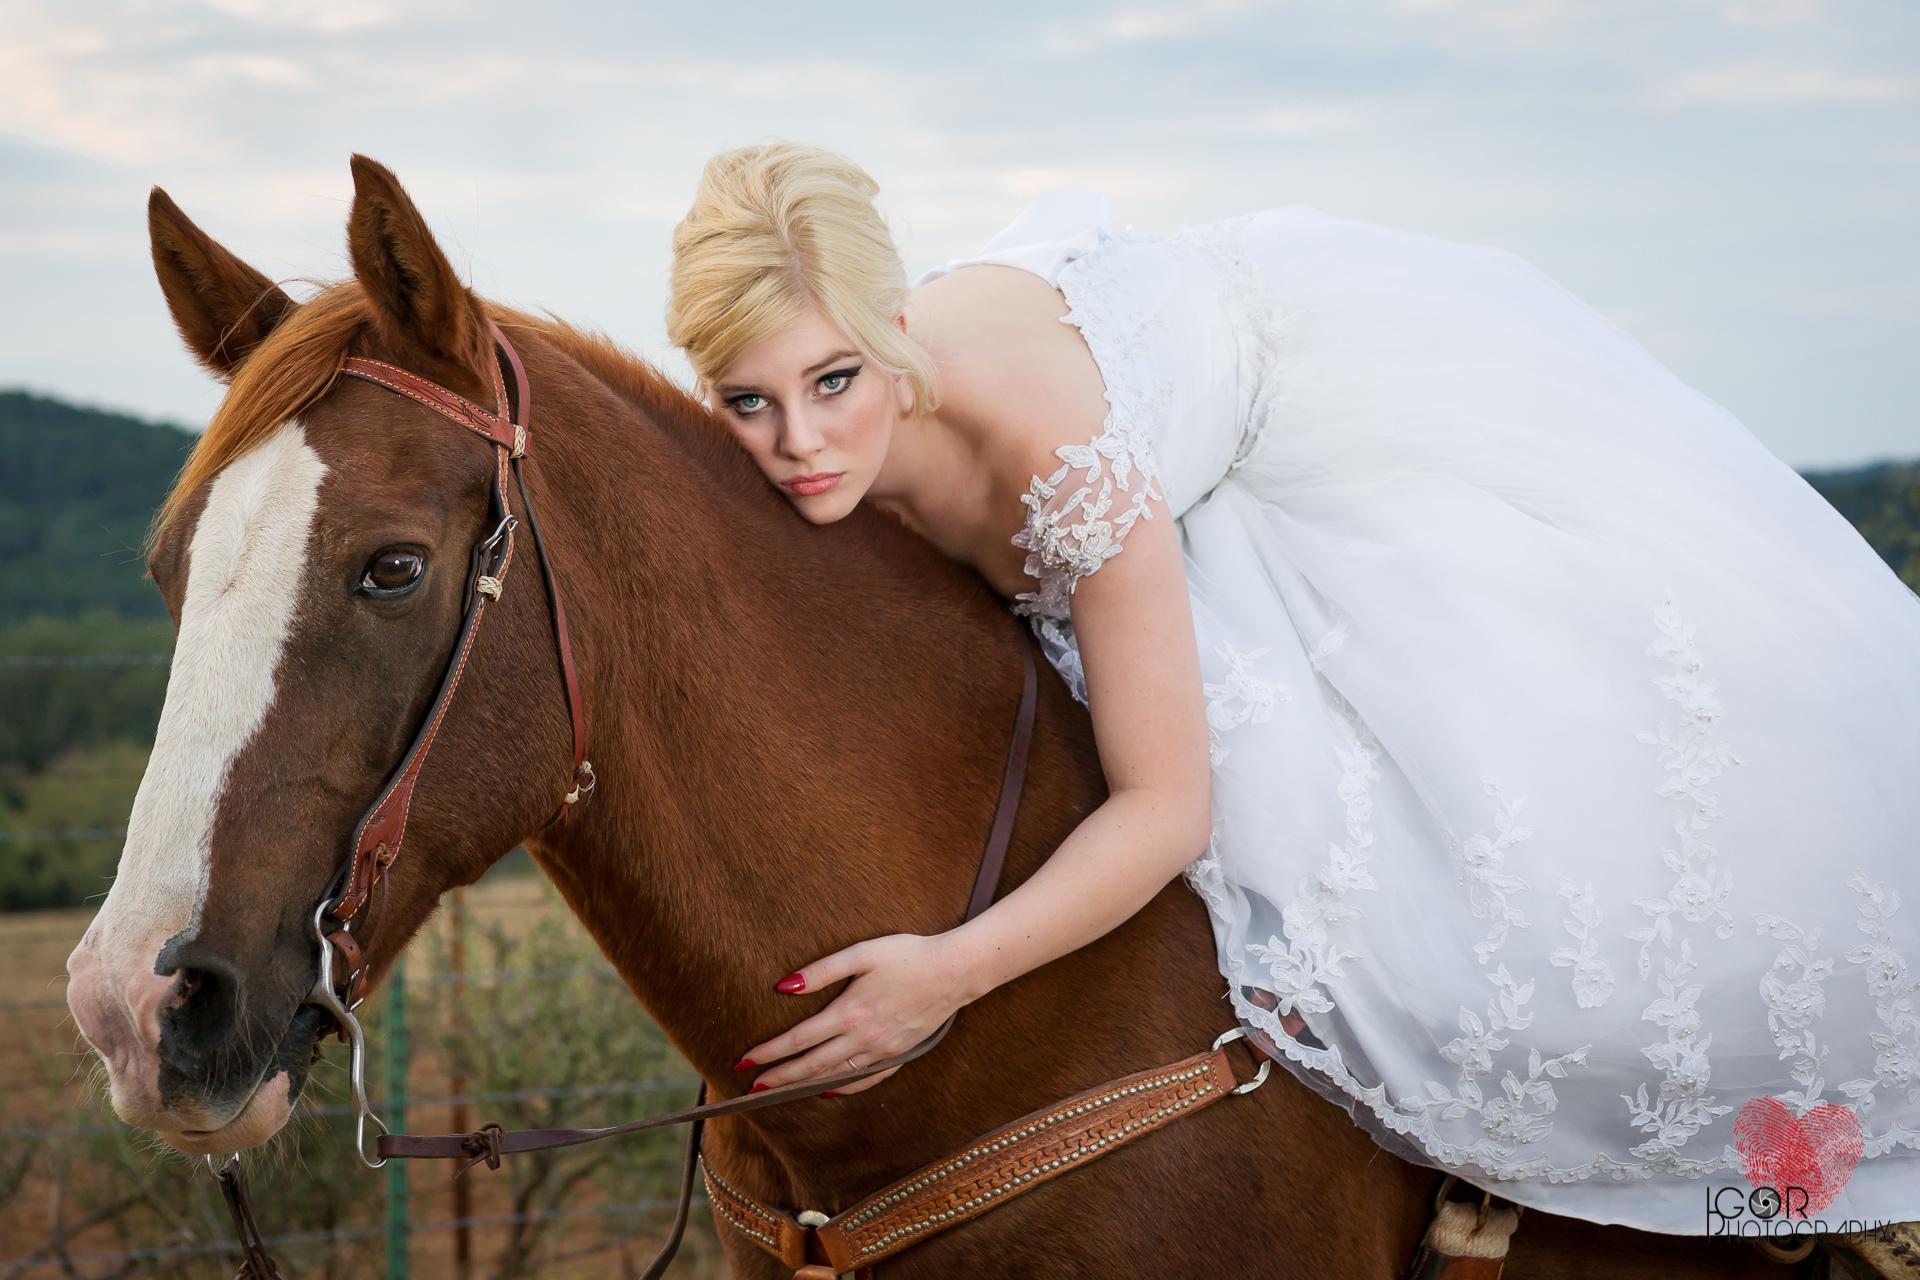 Kate-Colby-Horse-13.jpg